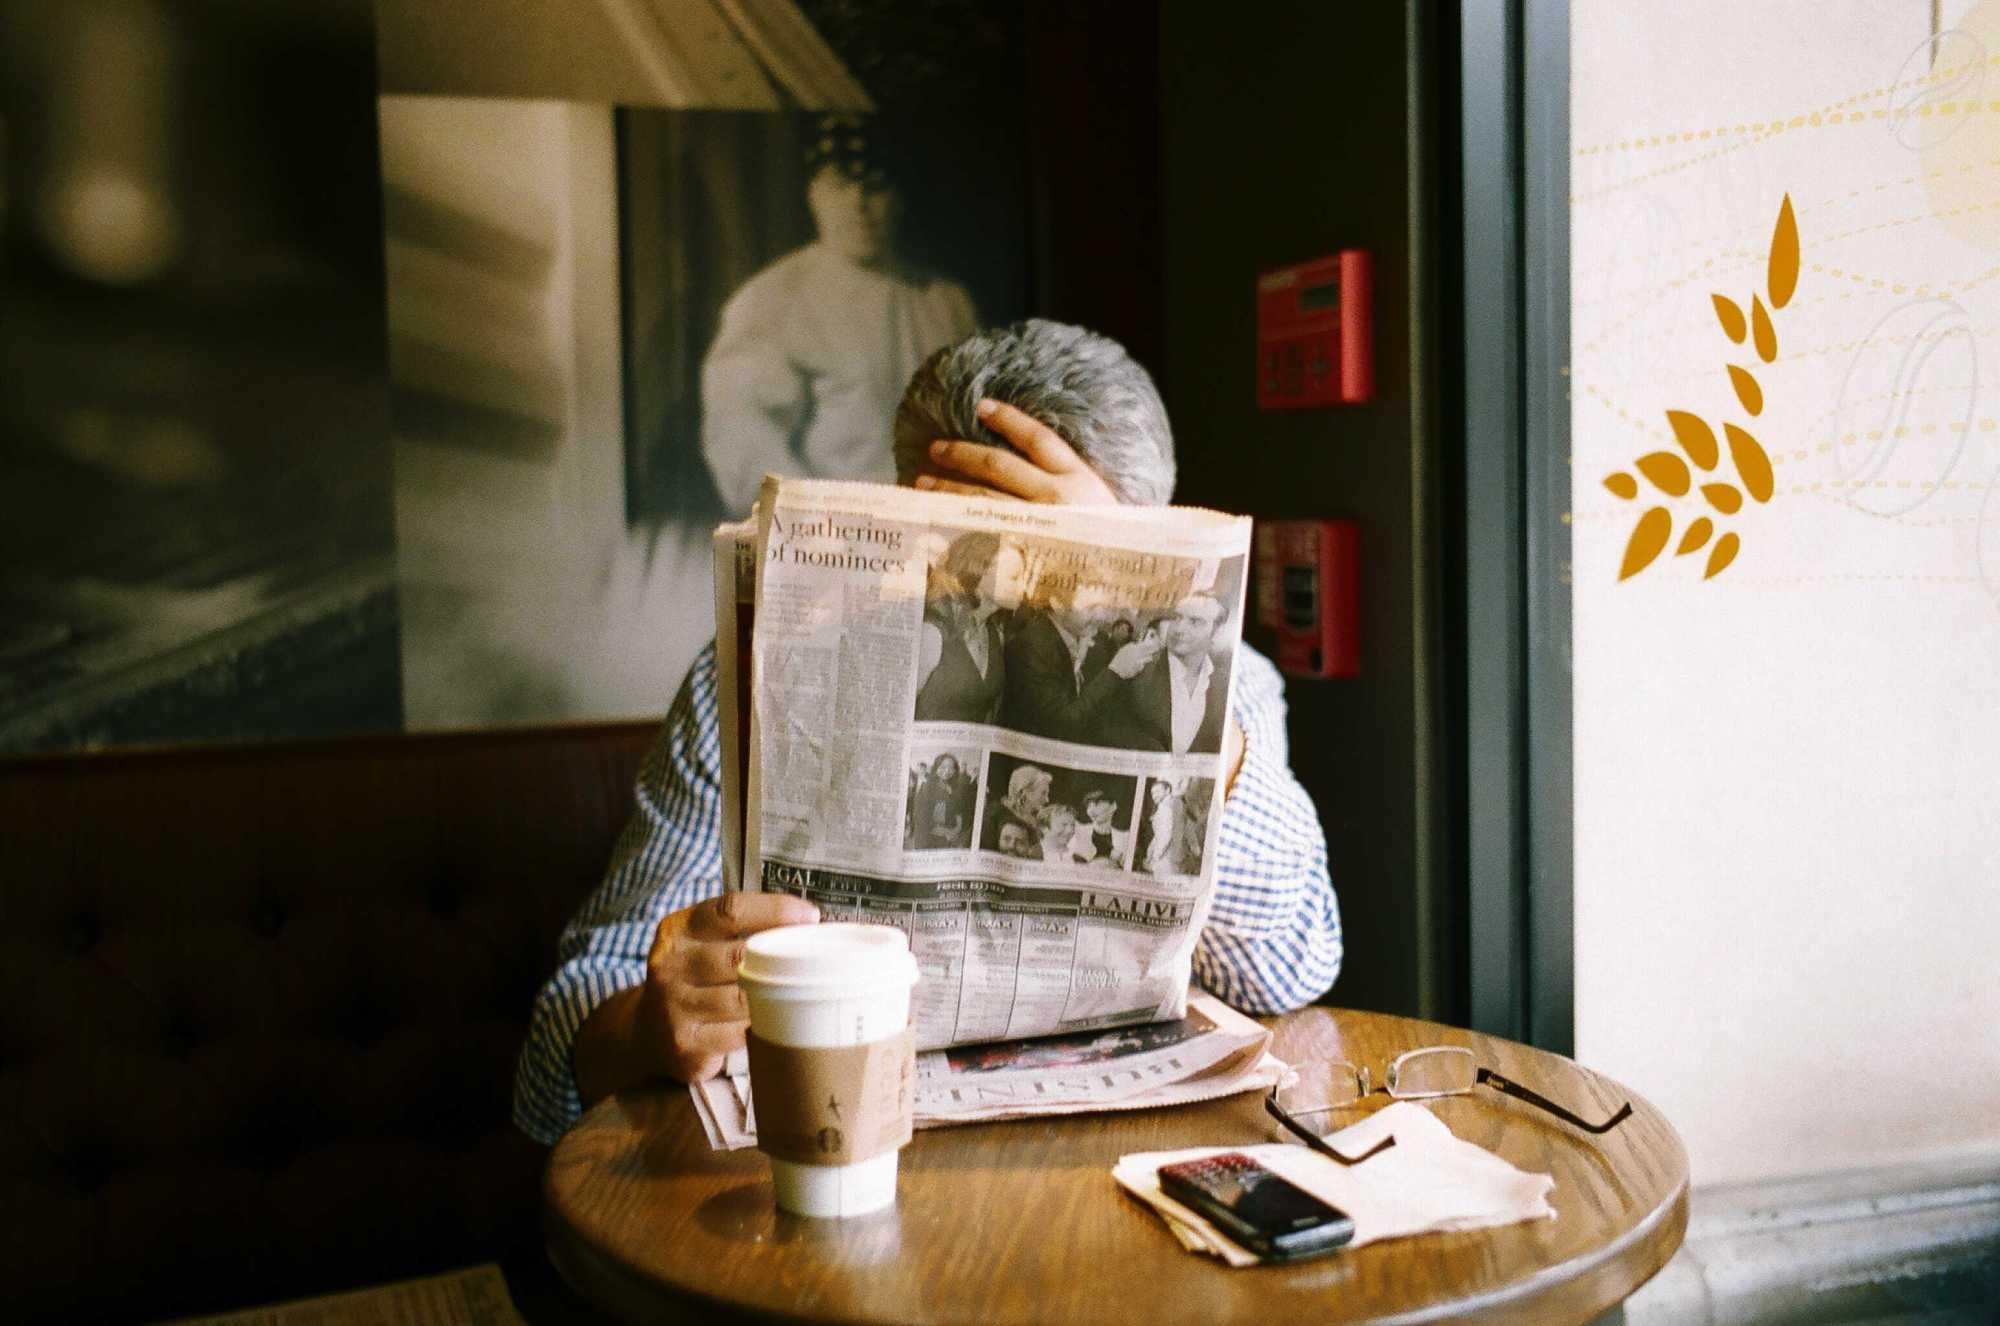 eric-kim-street-photography-suits-project-kodak-portra-400-film-9